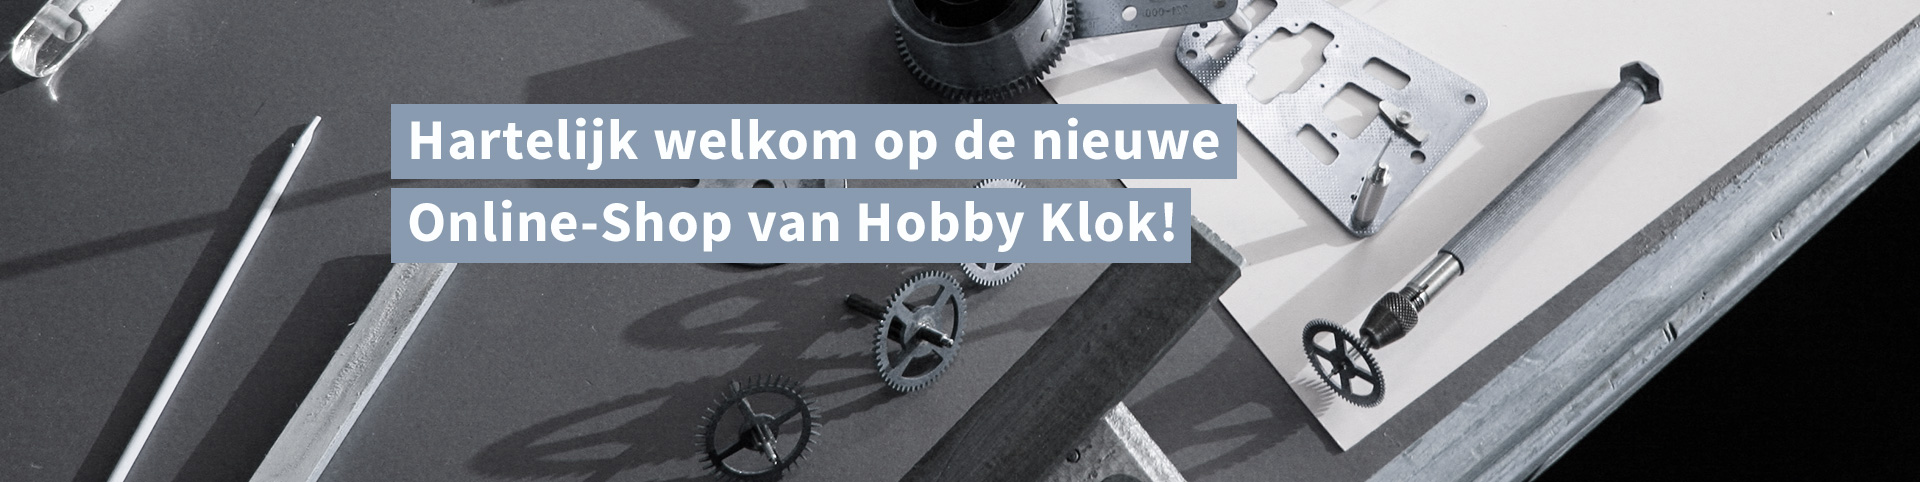 001 Willkommen_nl